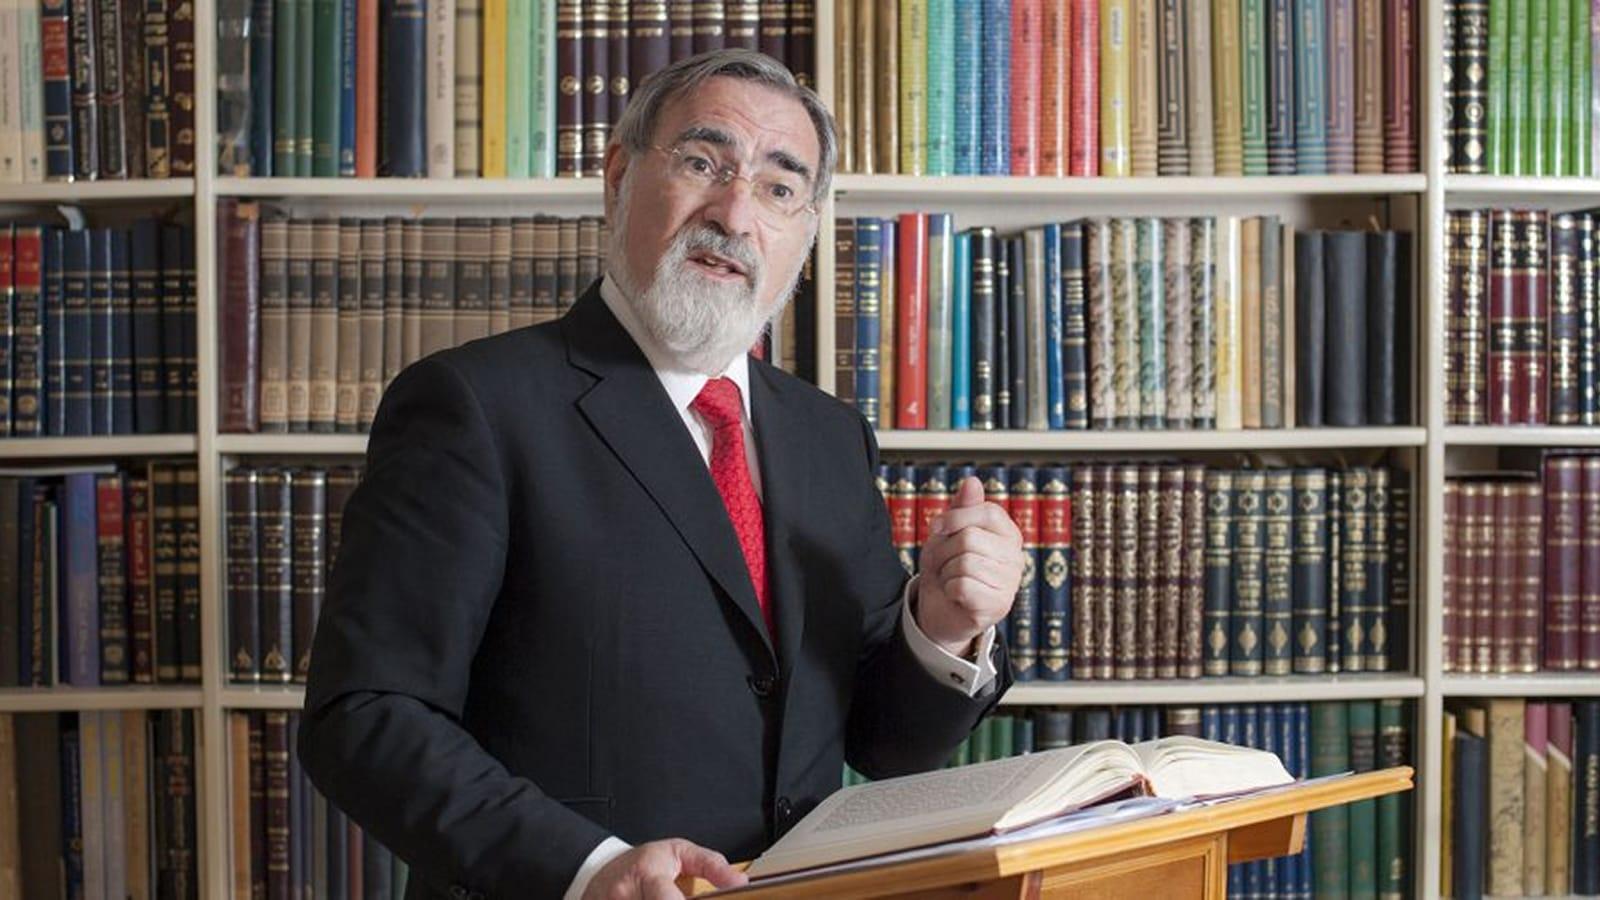 Rabbi Lord Jonathan Sacks speaks to an audience